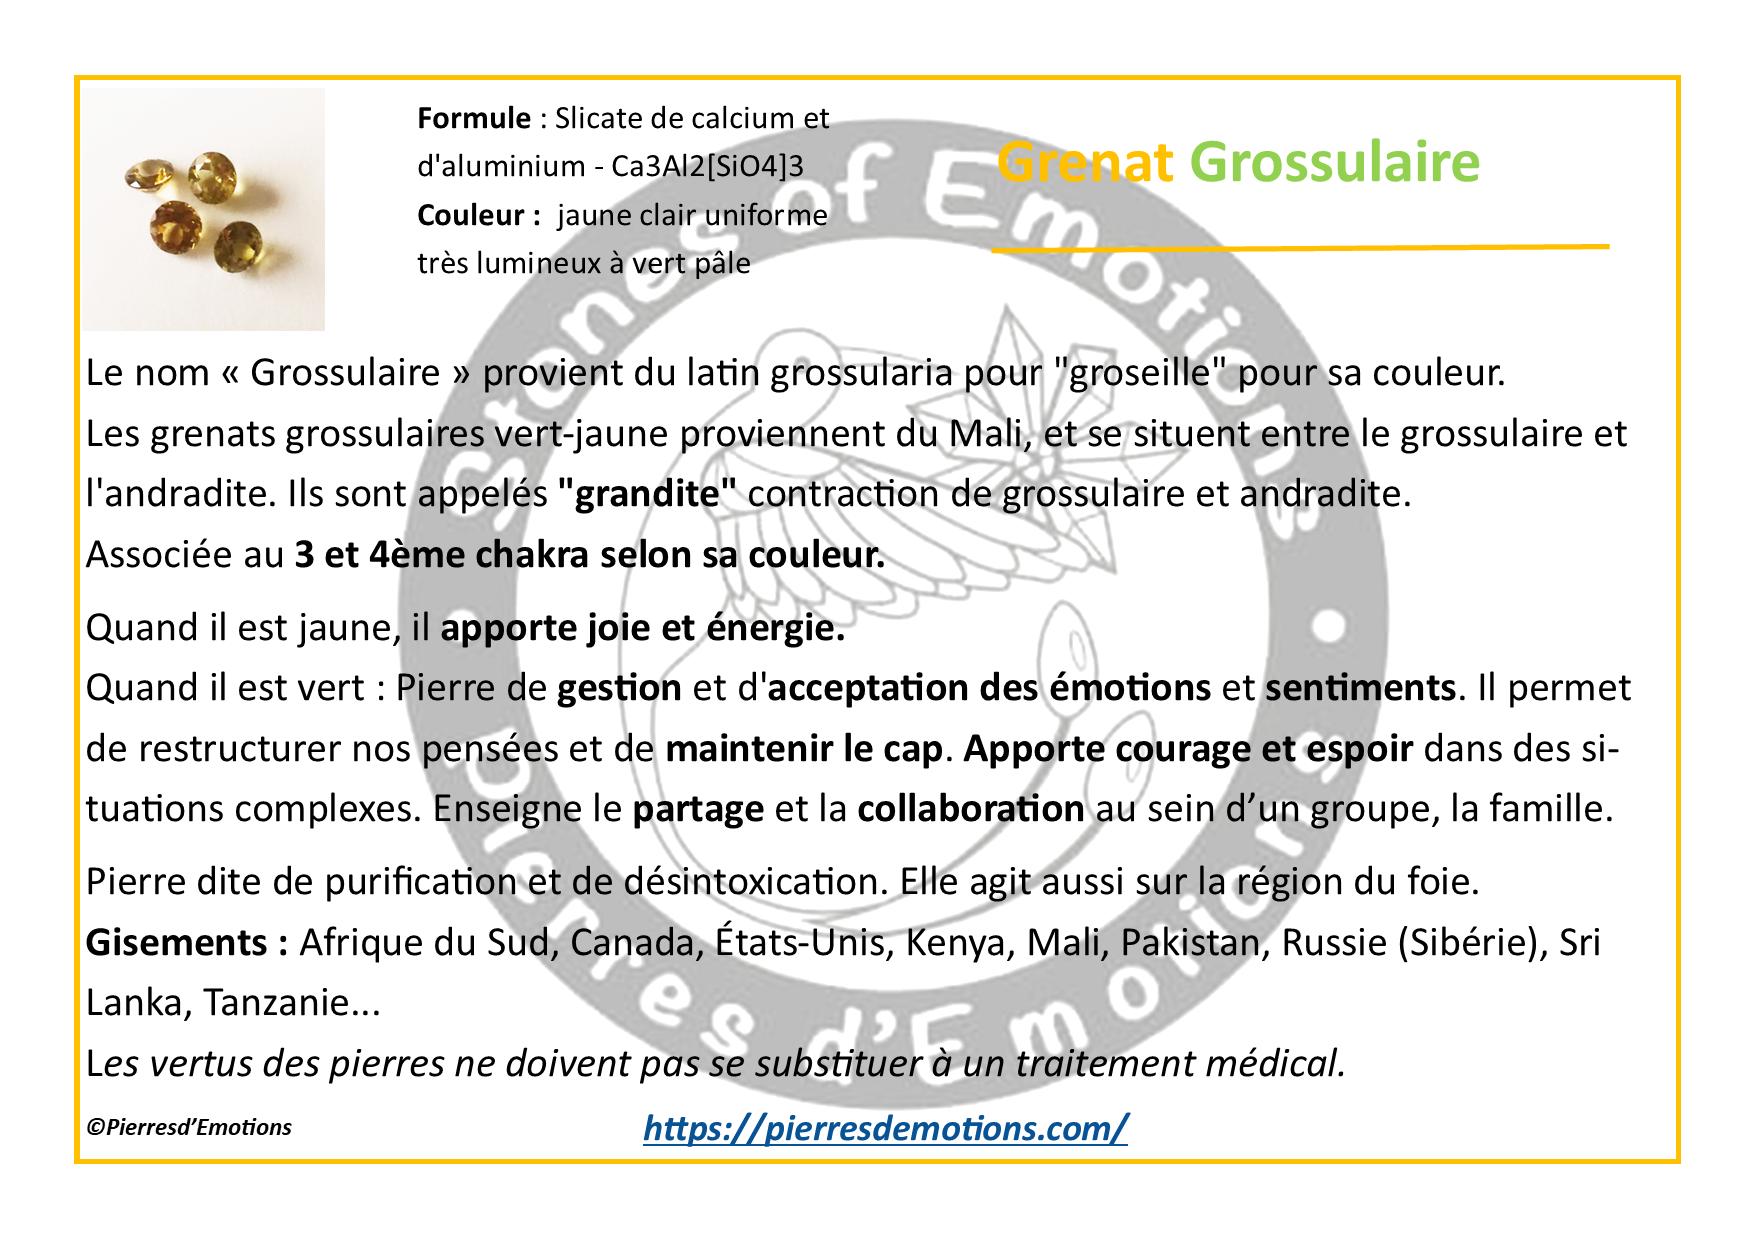 Grenat Grossulaire